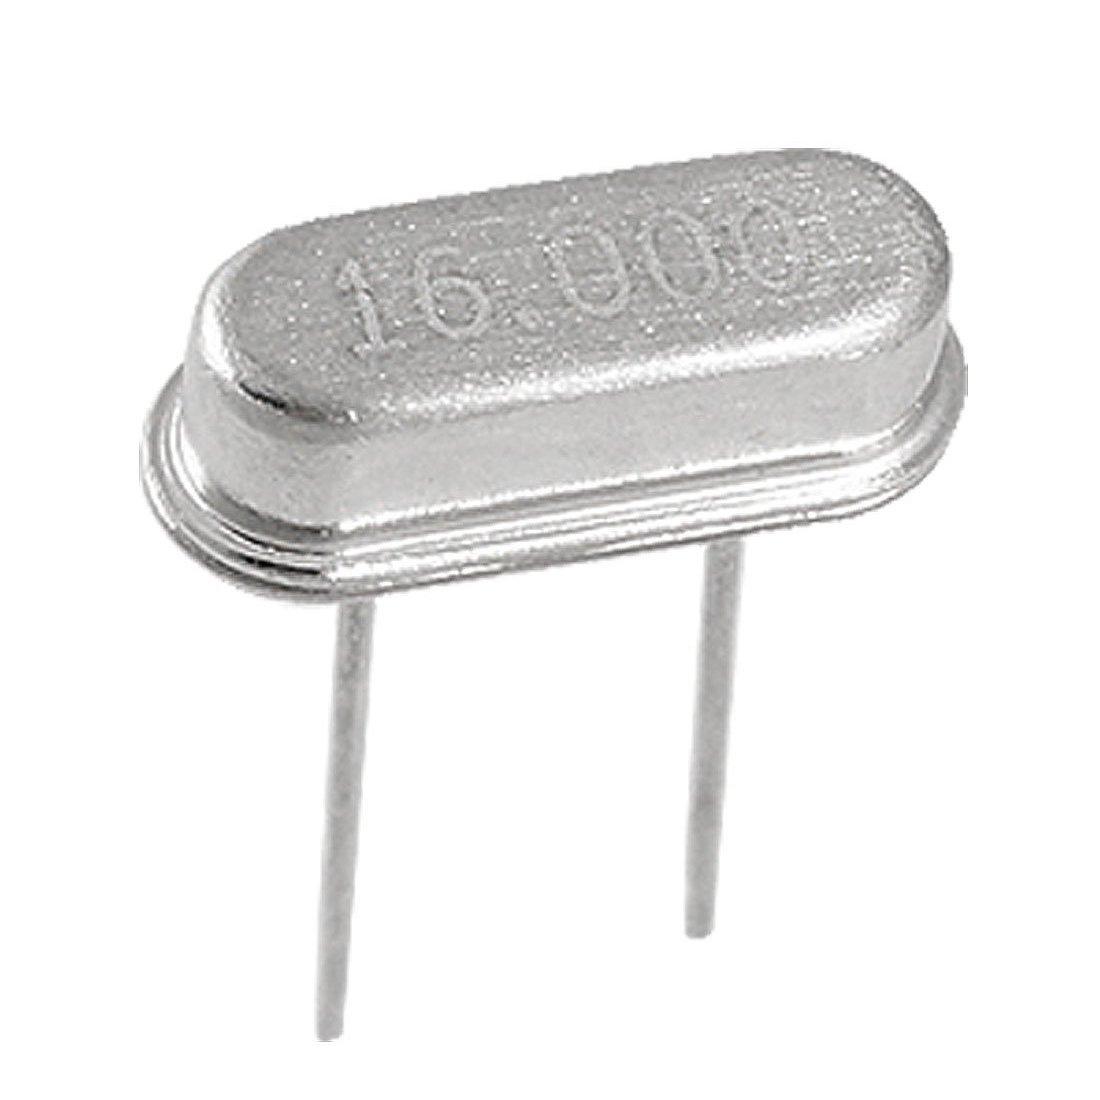 AT49S Crystal Oscillator - SODIAL(R) 3 x 16.000 MHz 16MHz Crystal HC-49S Low Profile Crystal Oscillator